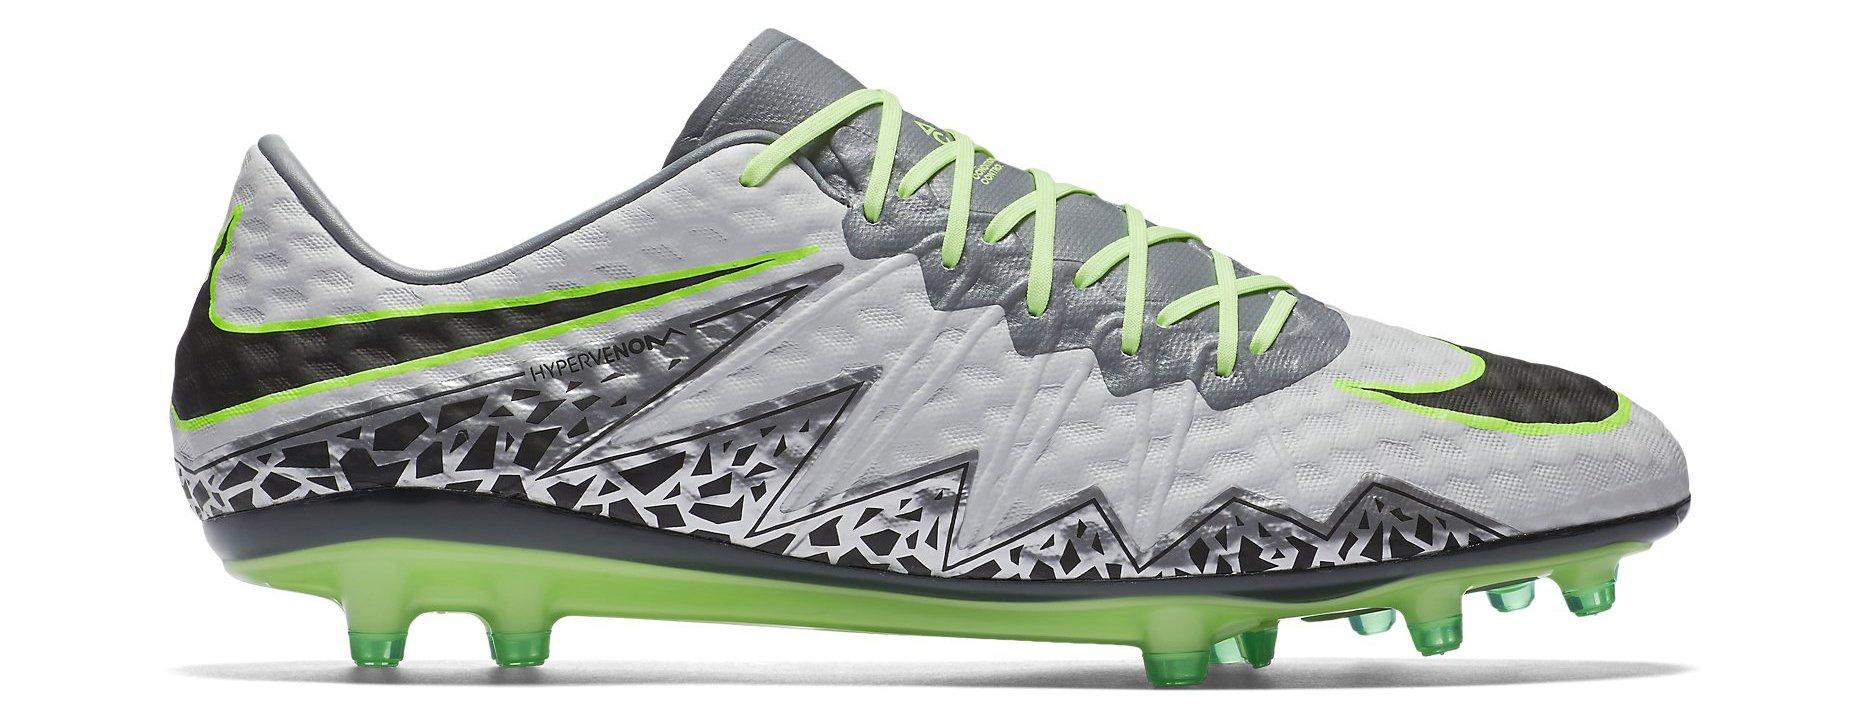 Kopačky Nike Hypervenom II Phinish FG